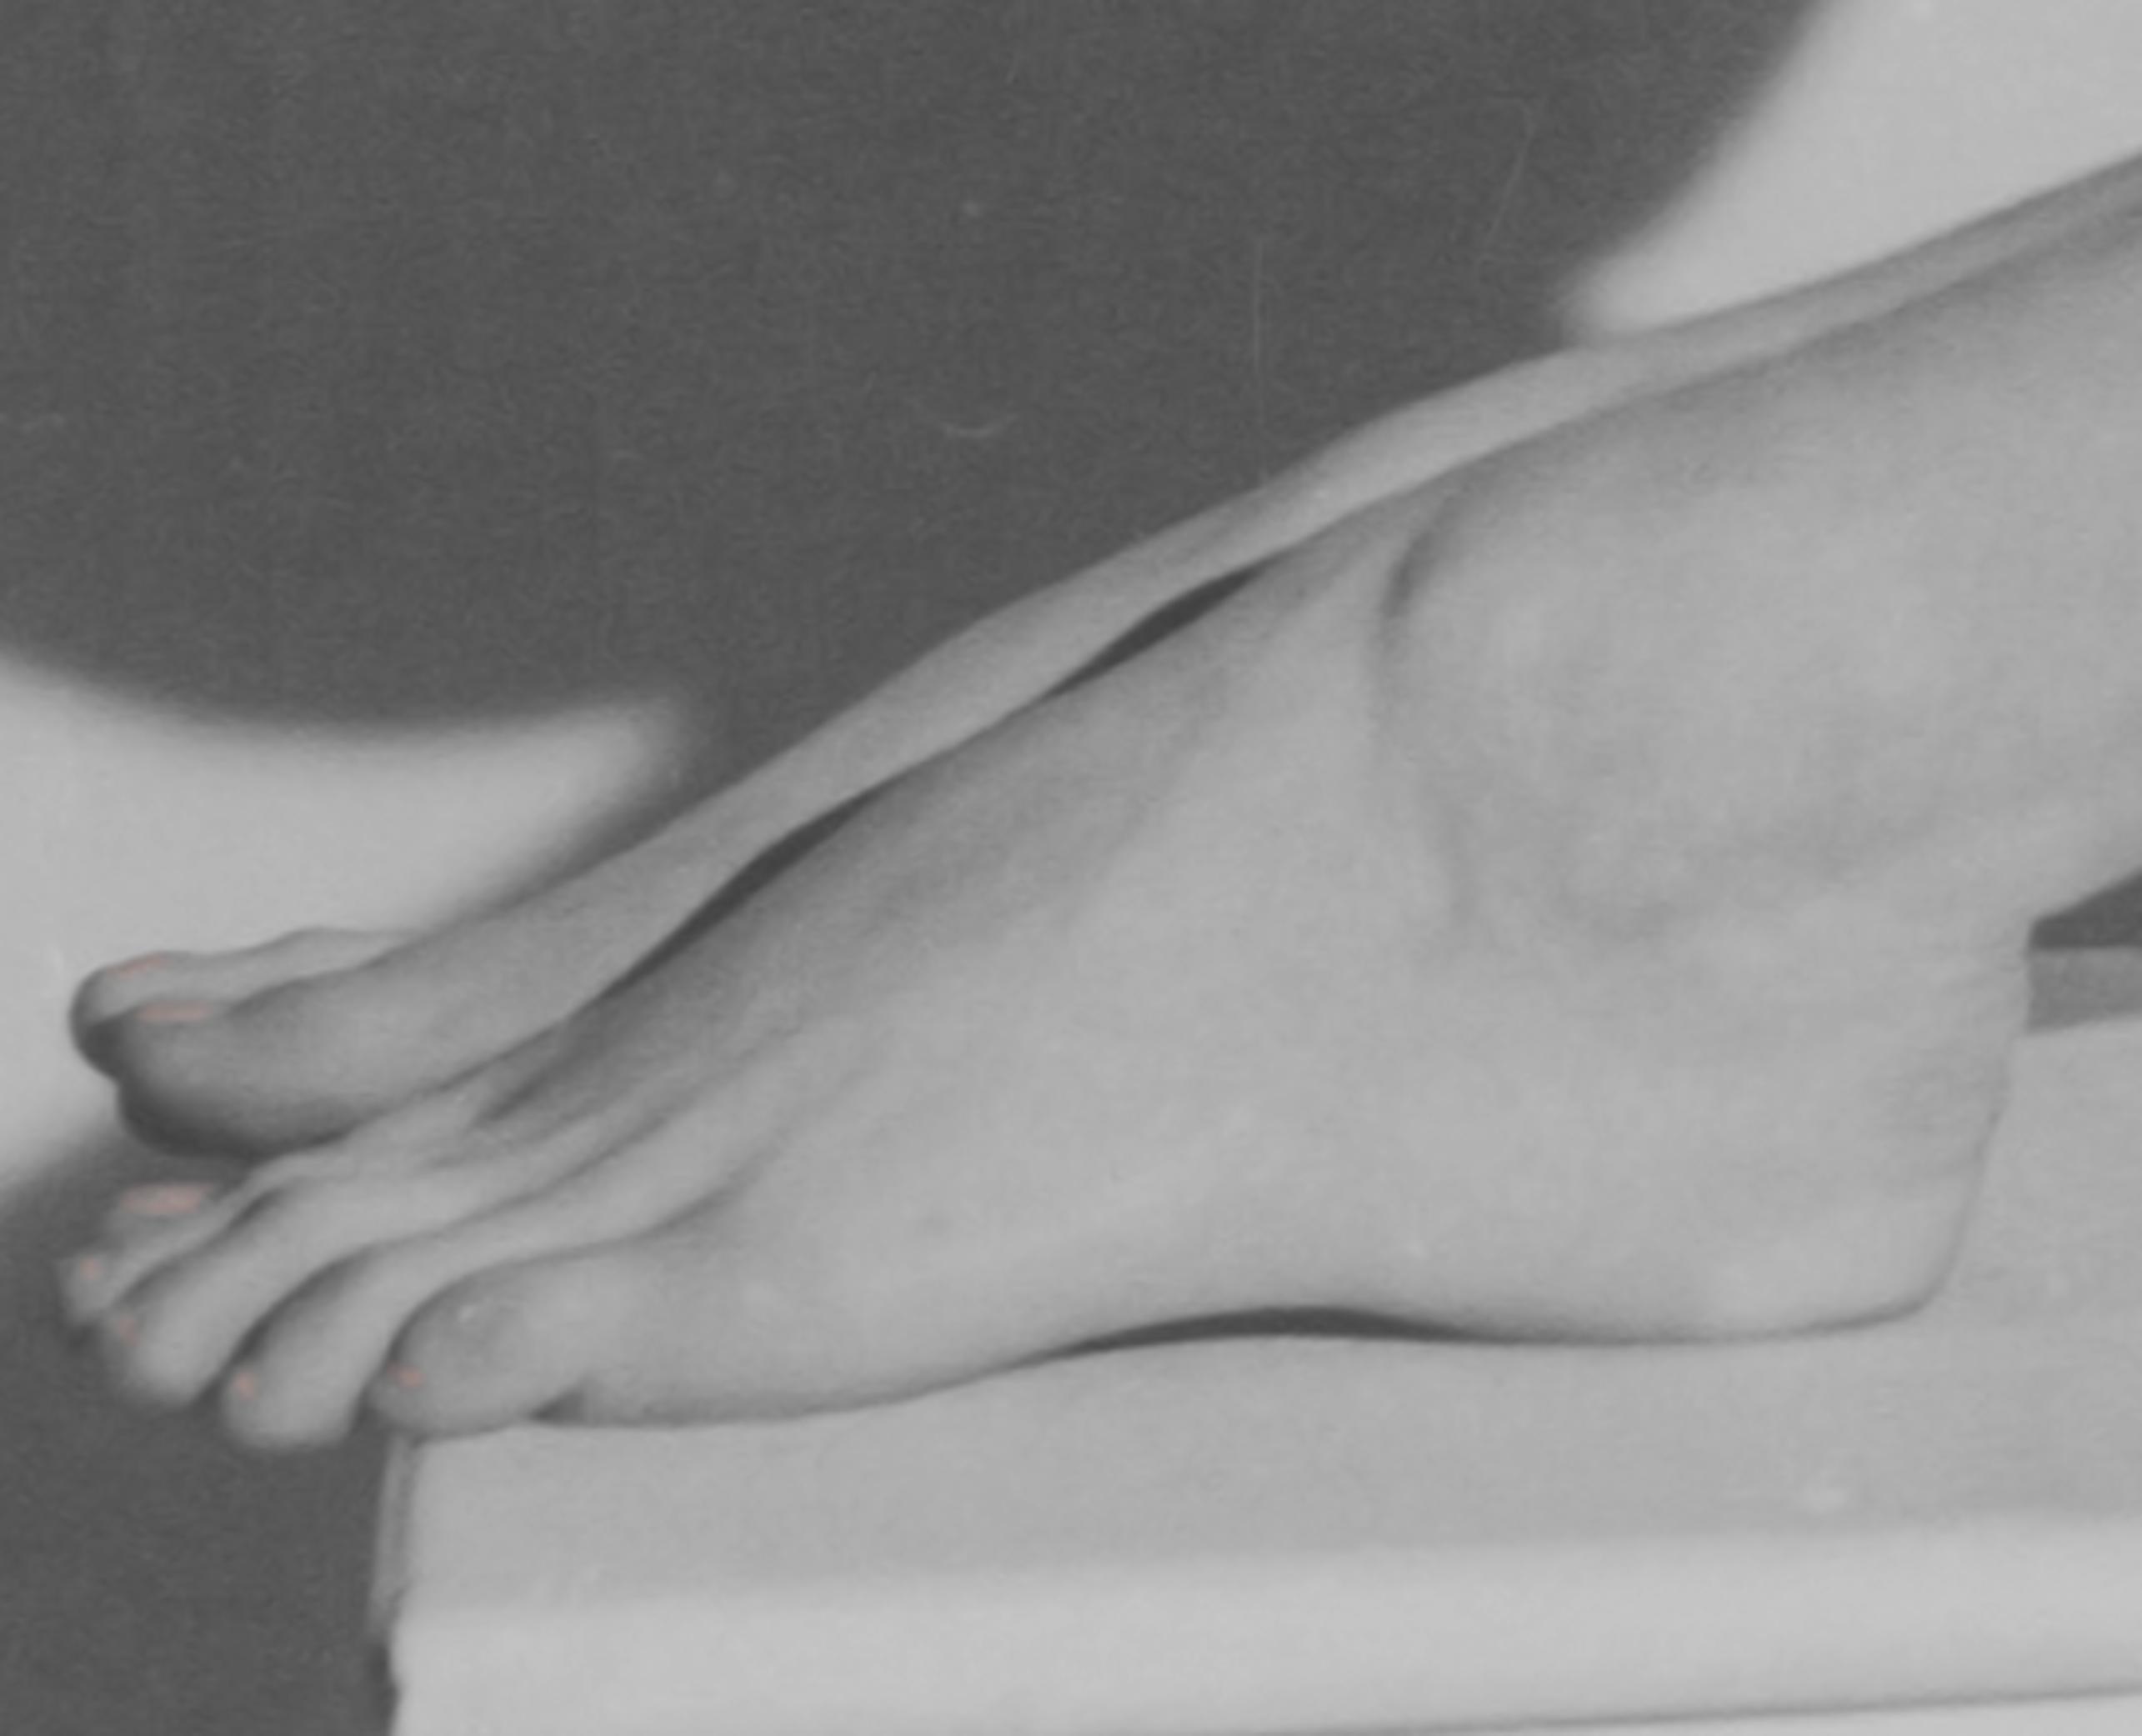 Brigitte Bardot's Feet